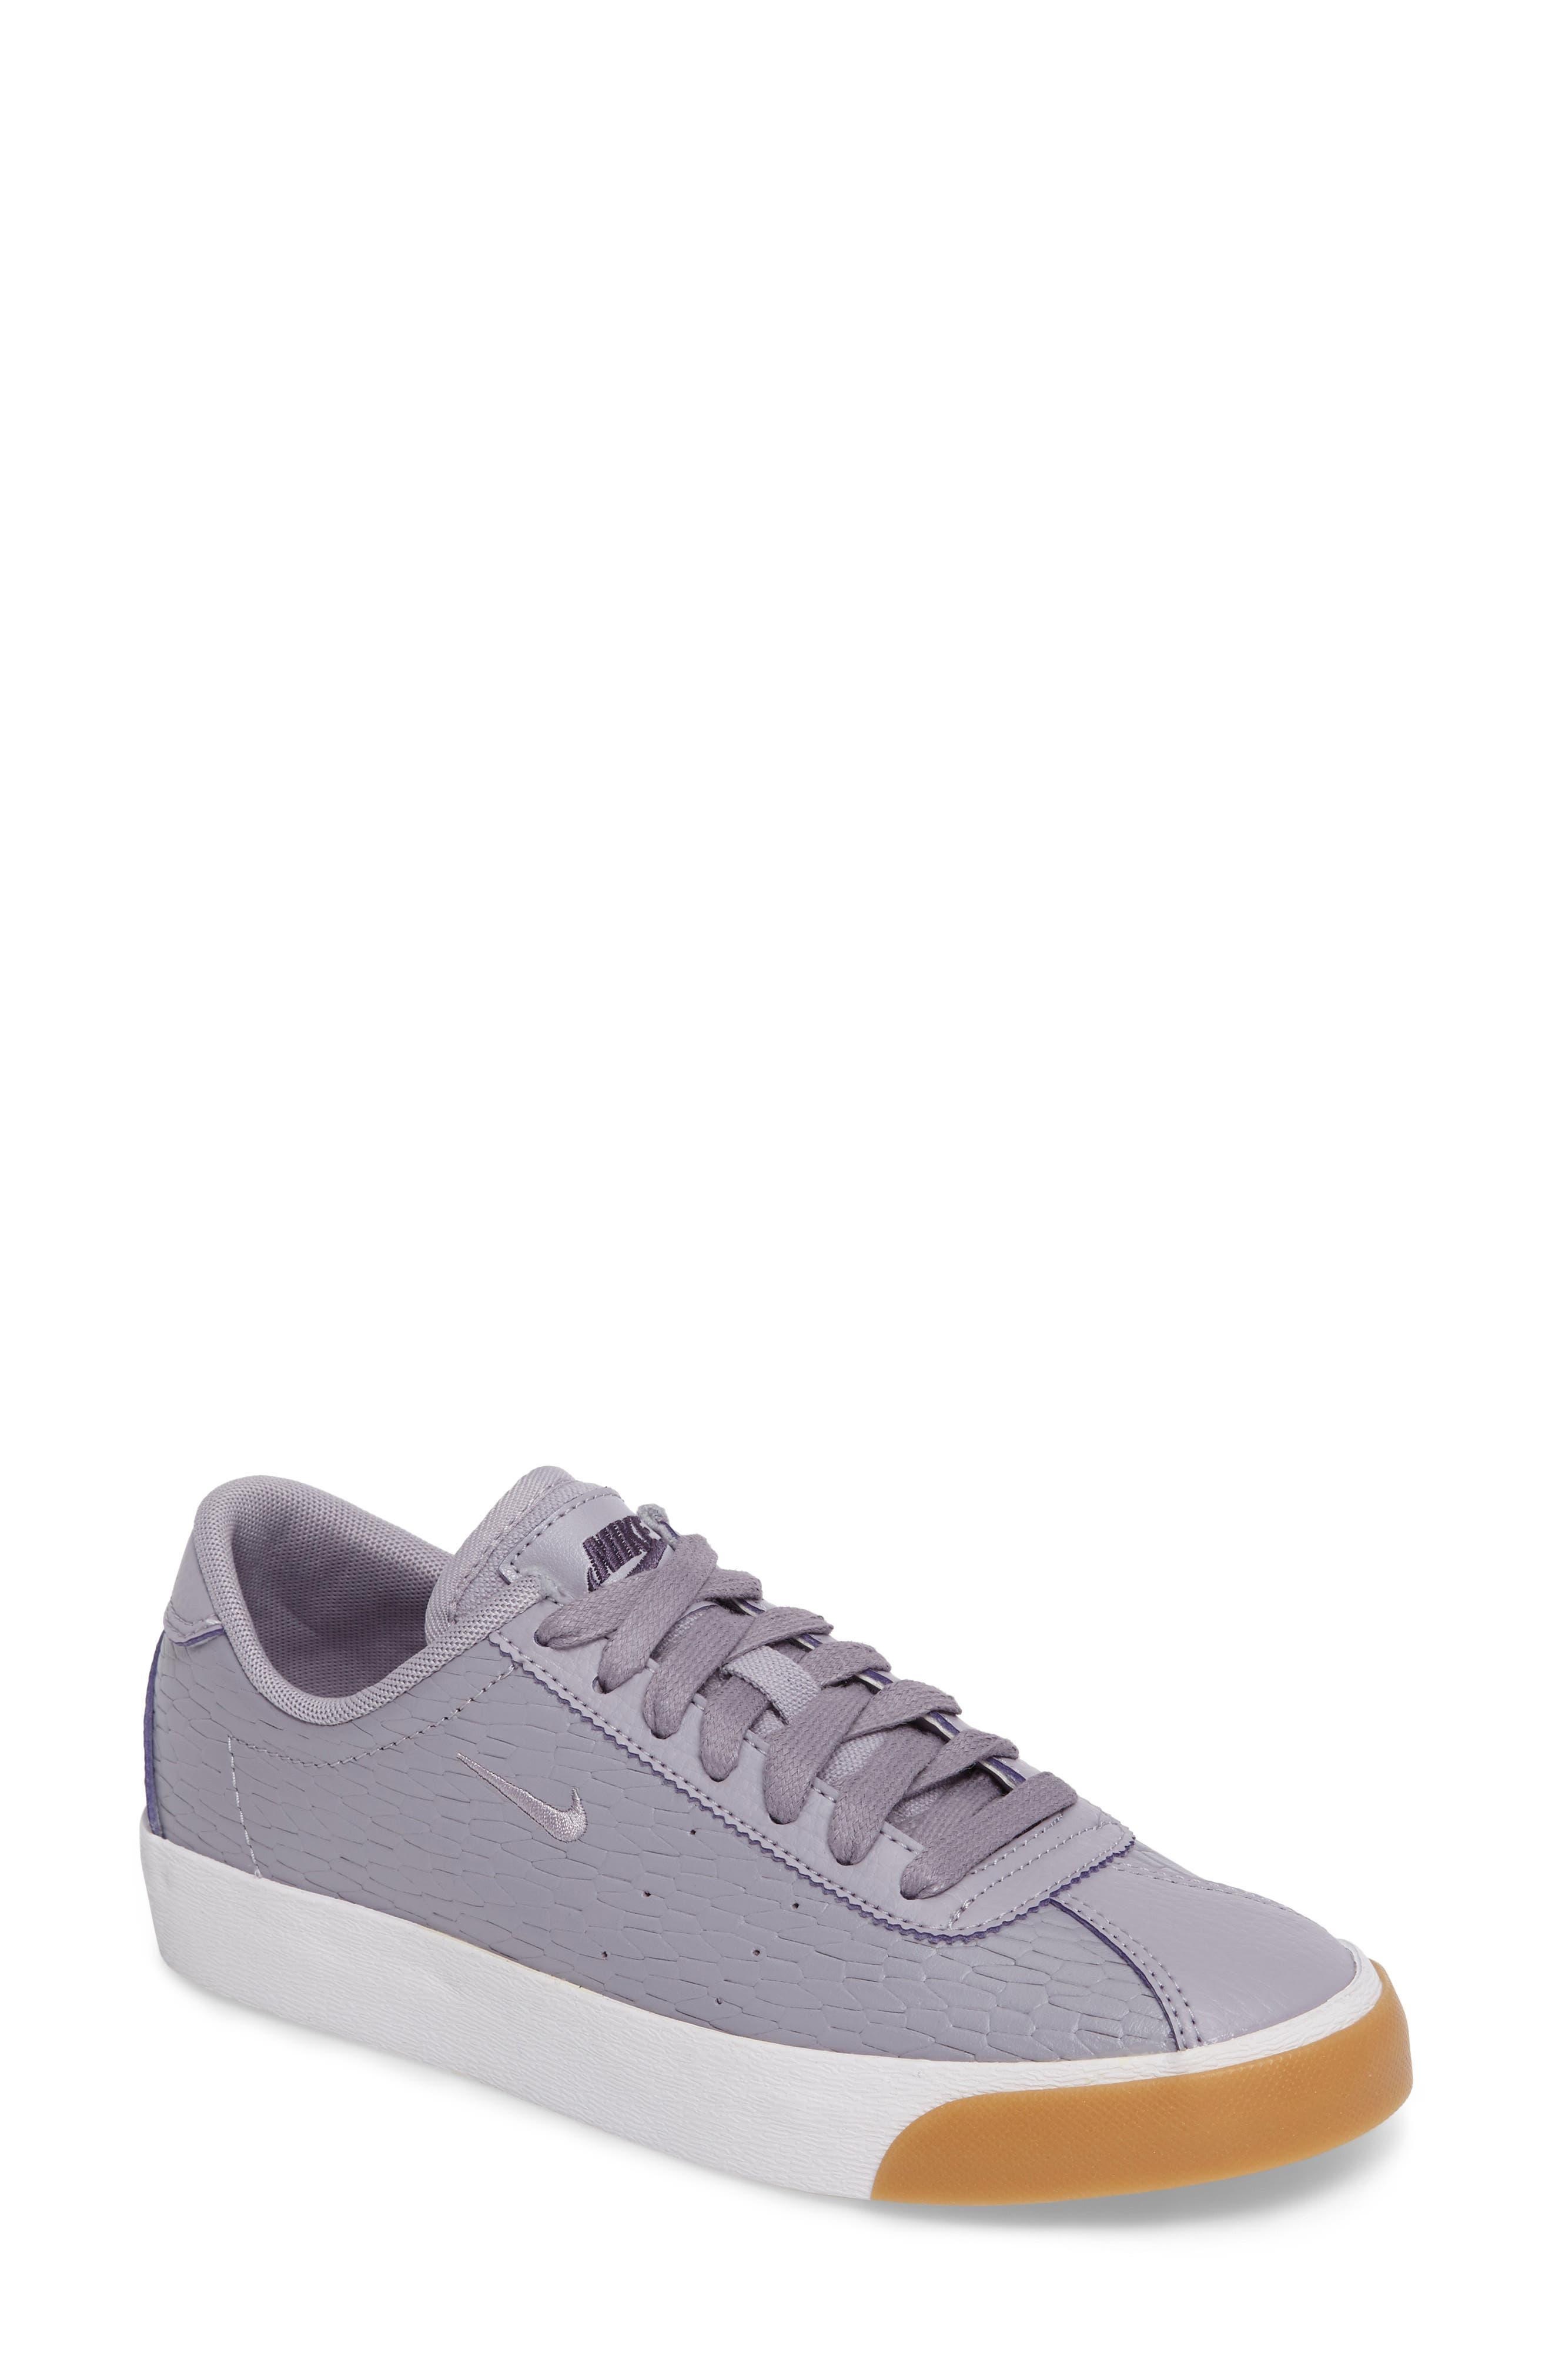 Match Classic Sneaker,                             Main thumbnail 1, color,                             Provence Purple/ Purple